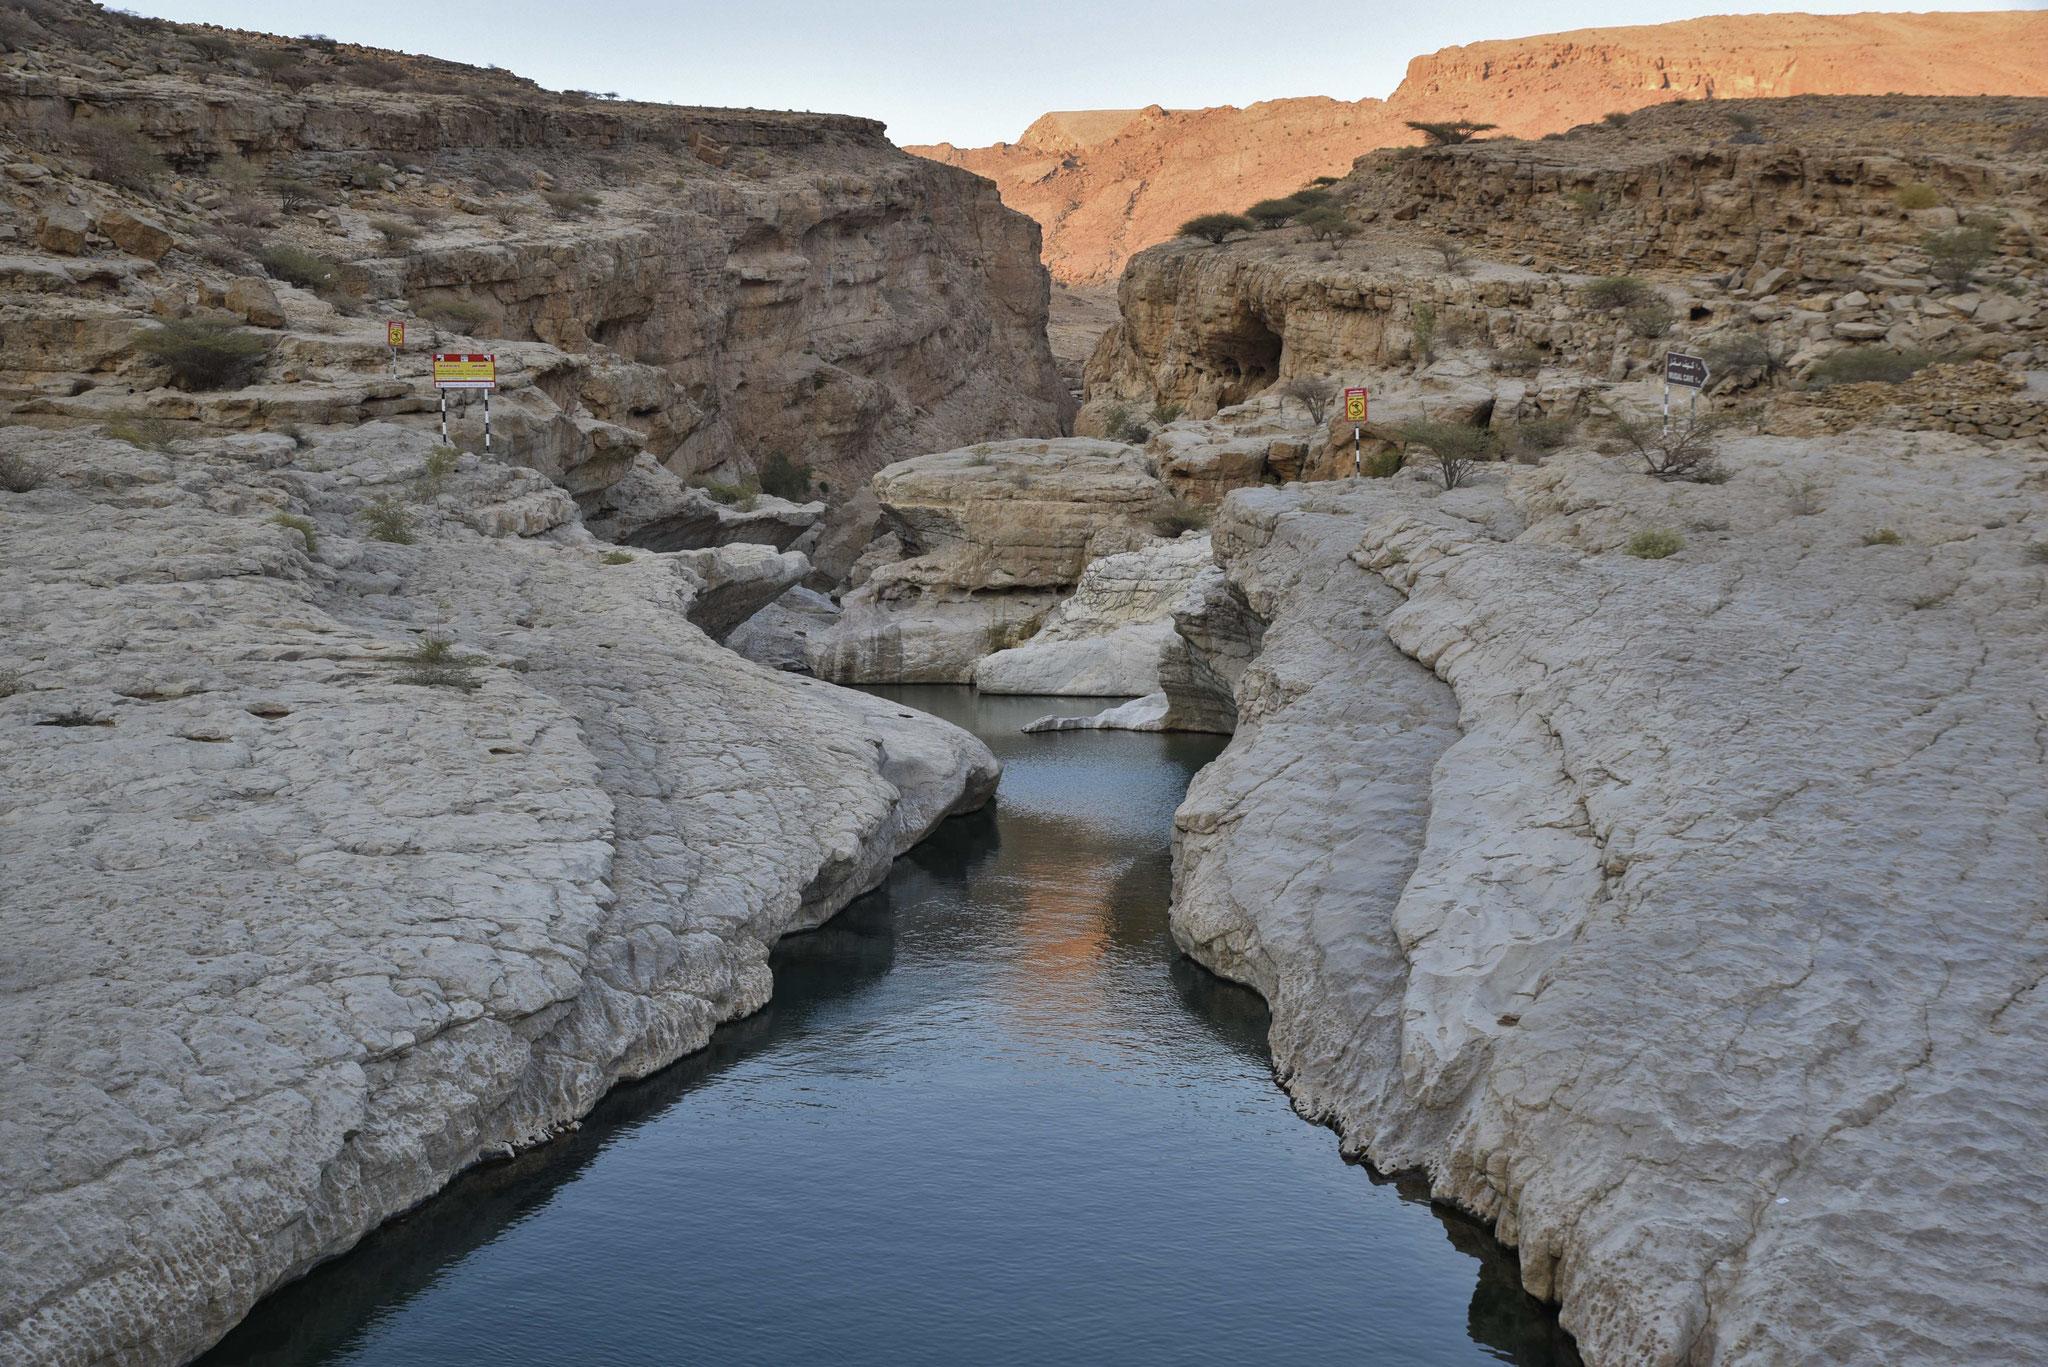 Wadi Bani Khalid I